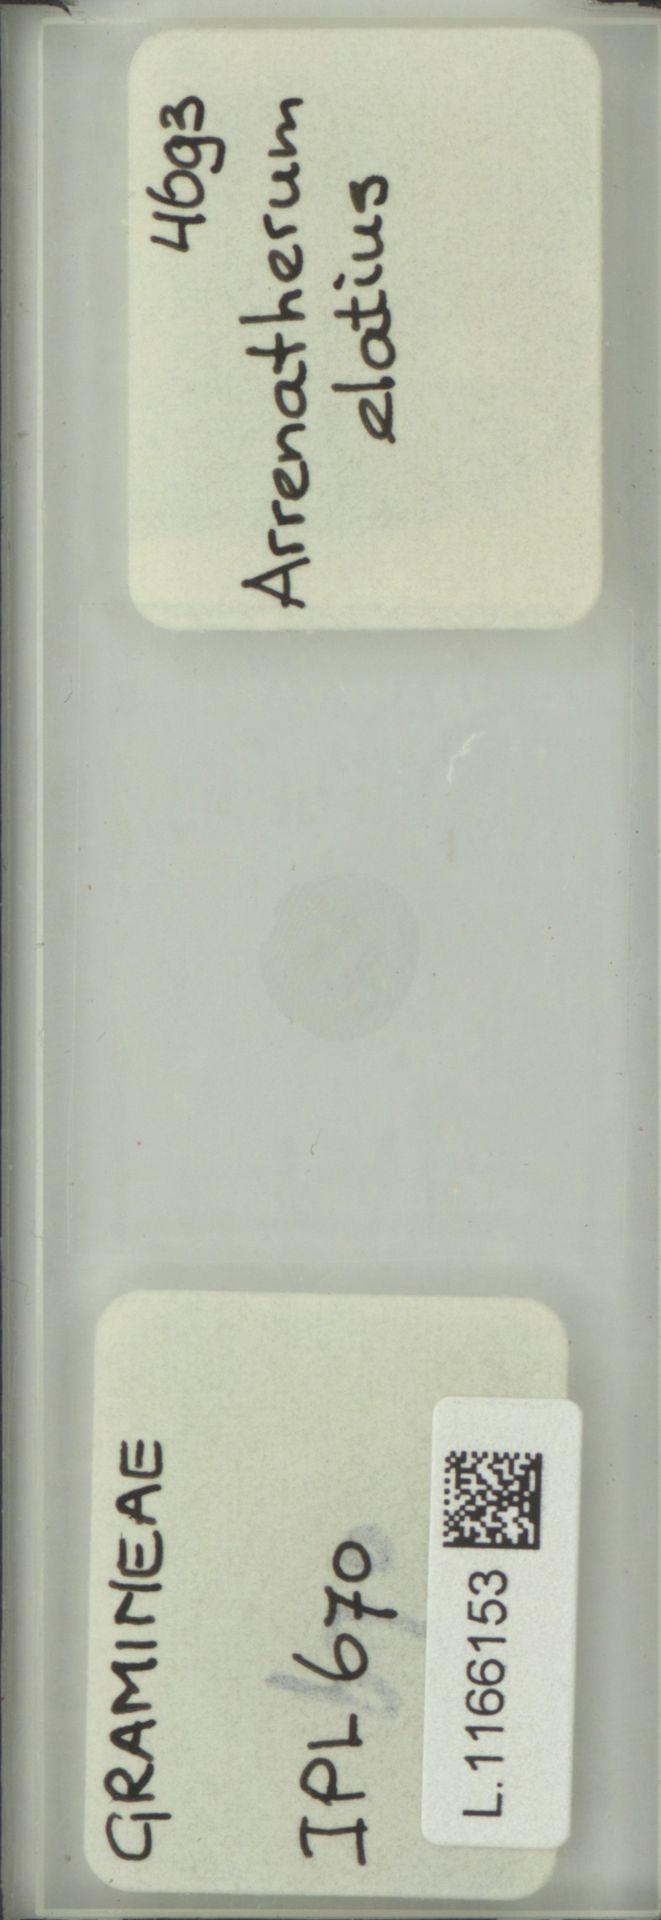 L.1166153 | Arrhenatherum elatius (L.) P.Beauv. ex J.Presl & C.Presl